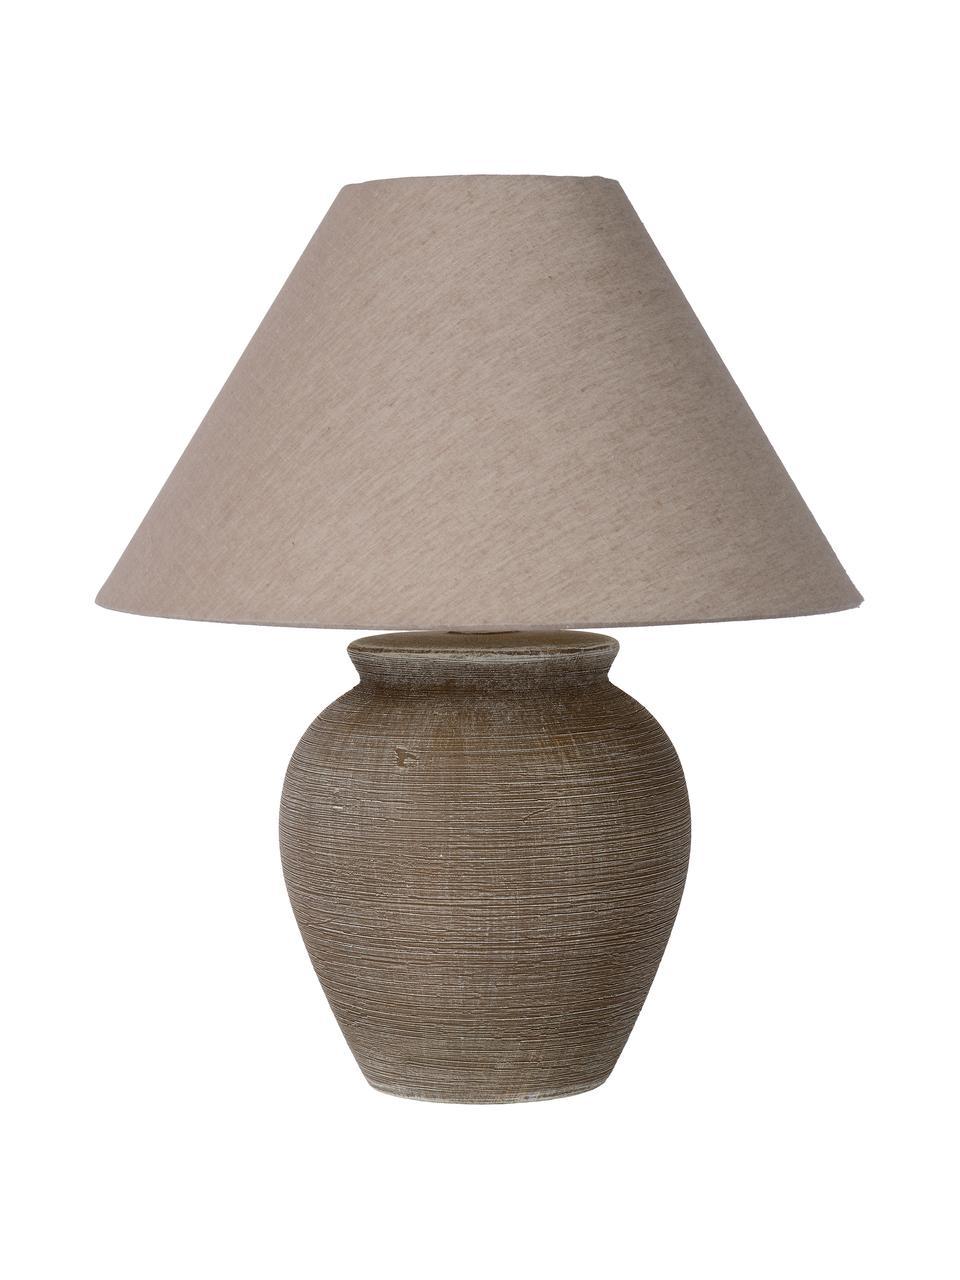 Keramik-Tischlampe Ramzi in Braun, Lampenschirm: Baumwolle, Lampenfuß: Keramik, Braun, Beige, Ø 34 x H 42 cm